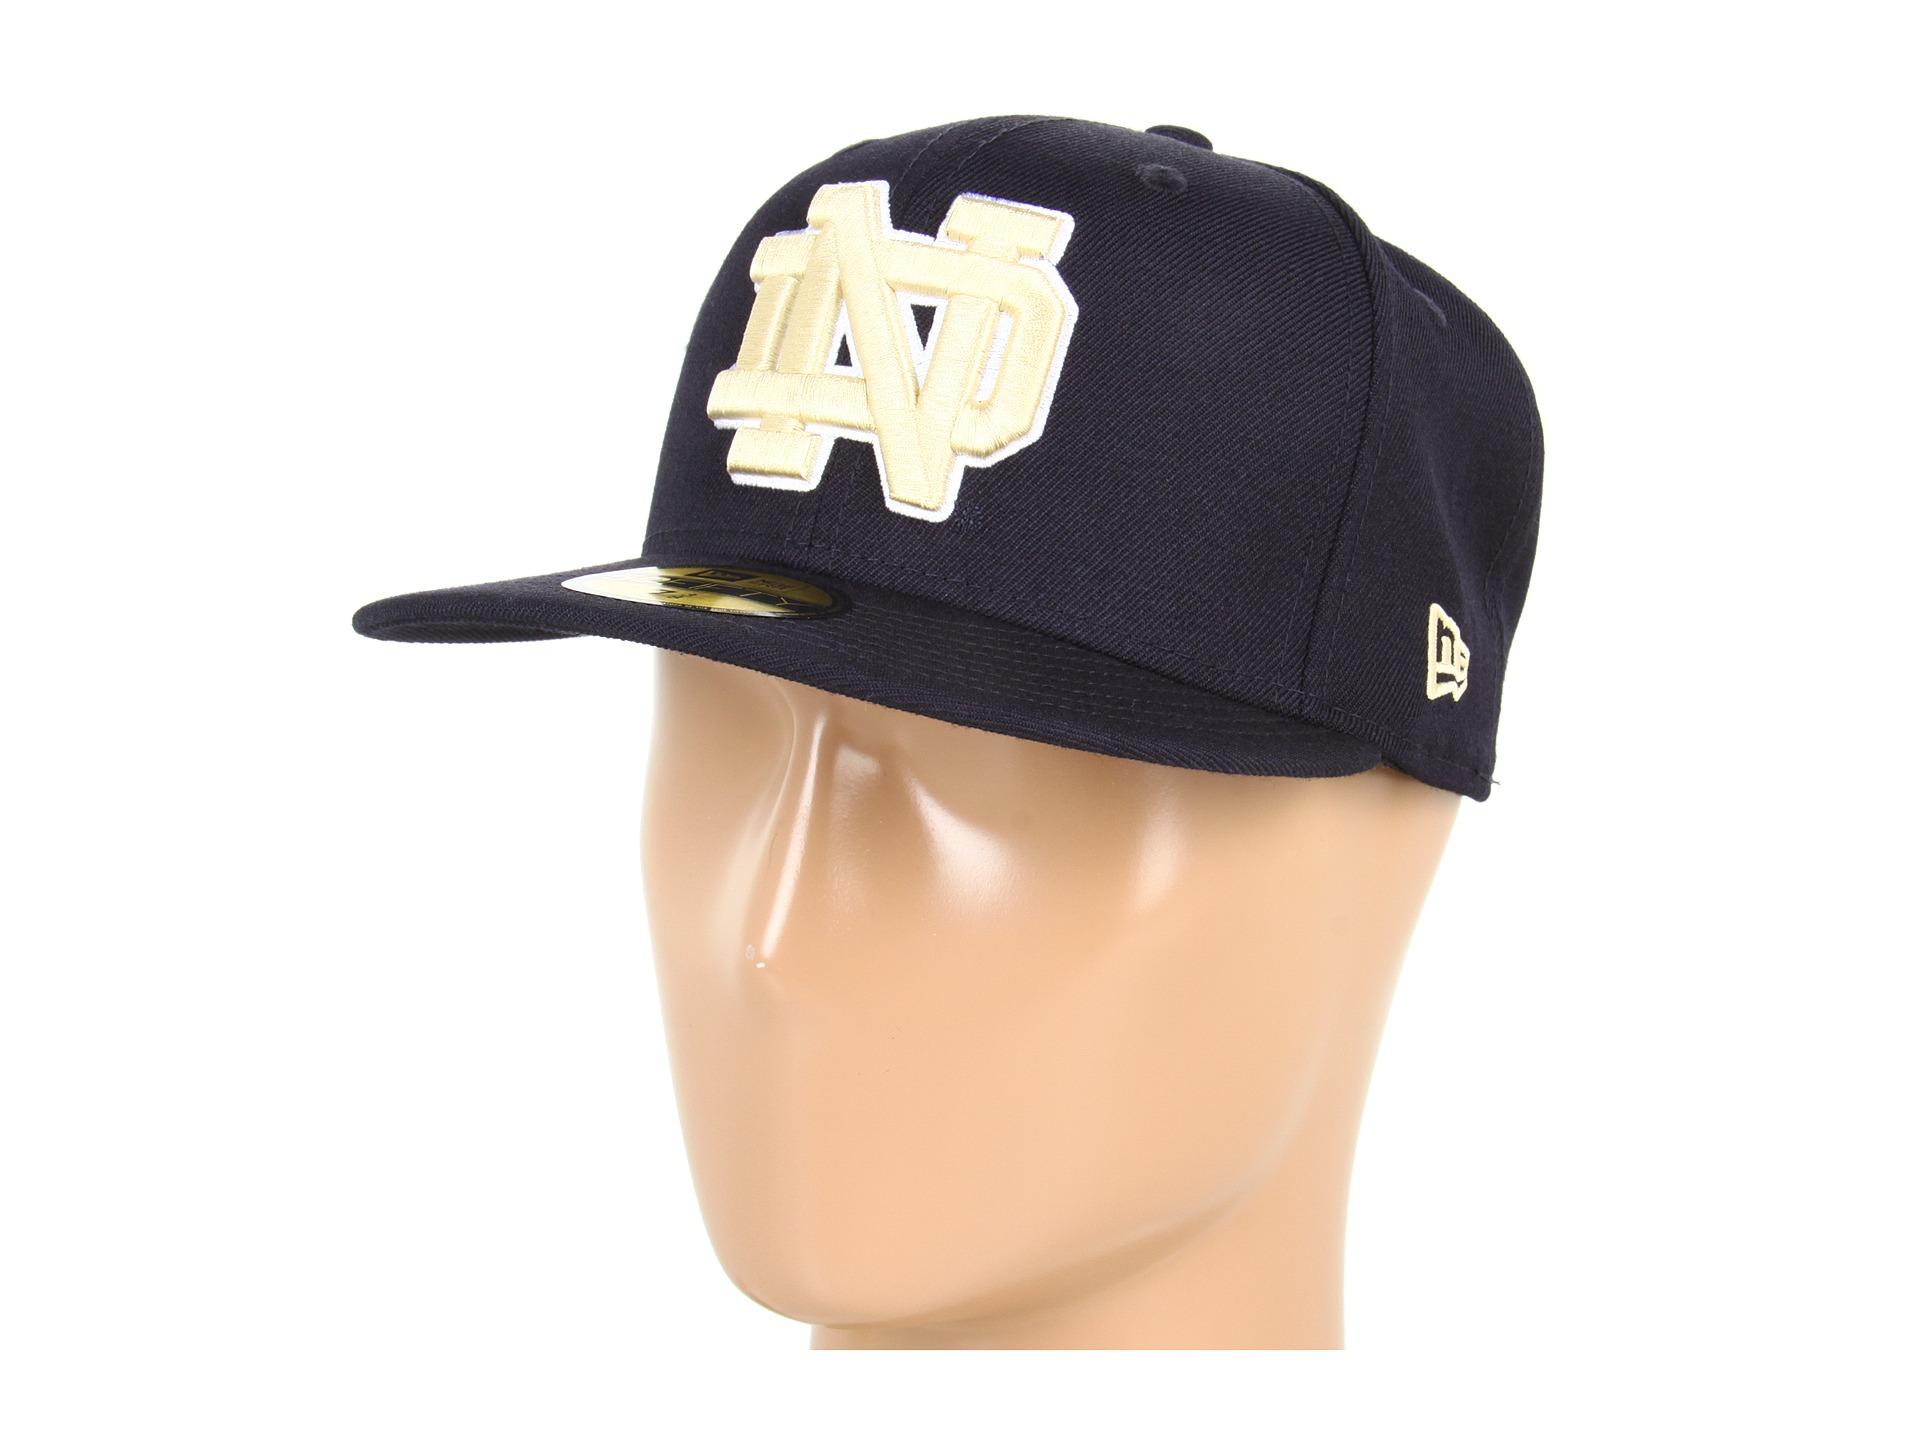 b6bbd329392 New Era Notre Dame Fighting Irish NCAA™ AC Stock 59FIFTY® Navy Gold ...